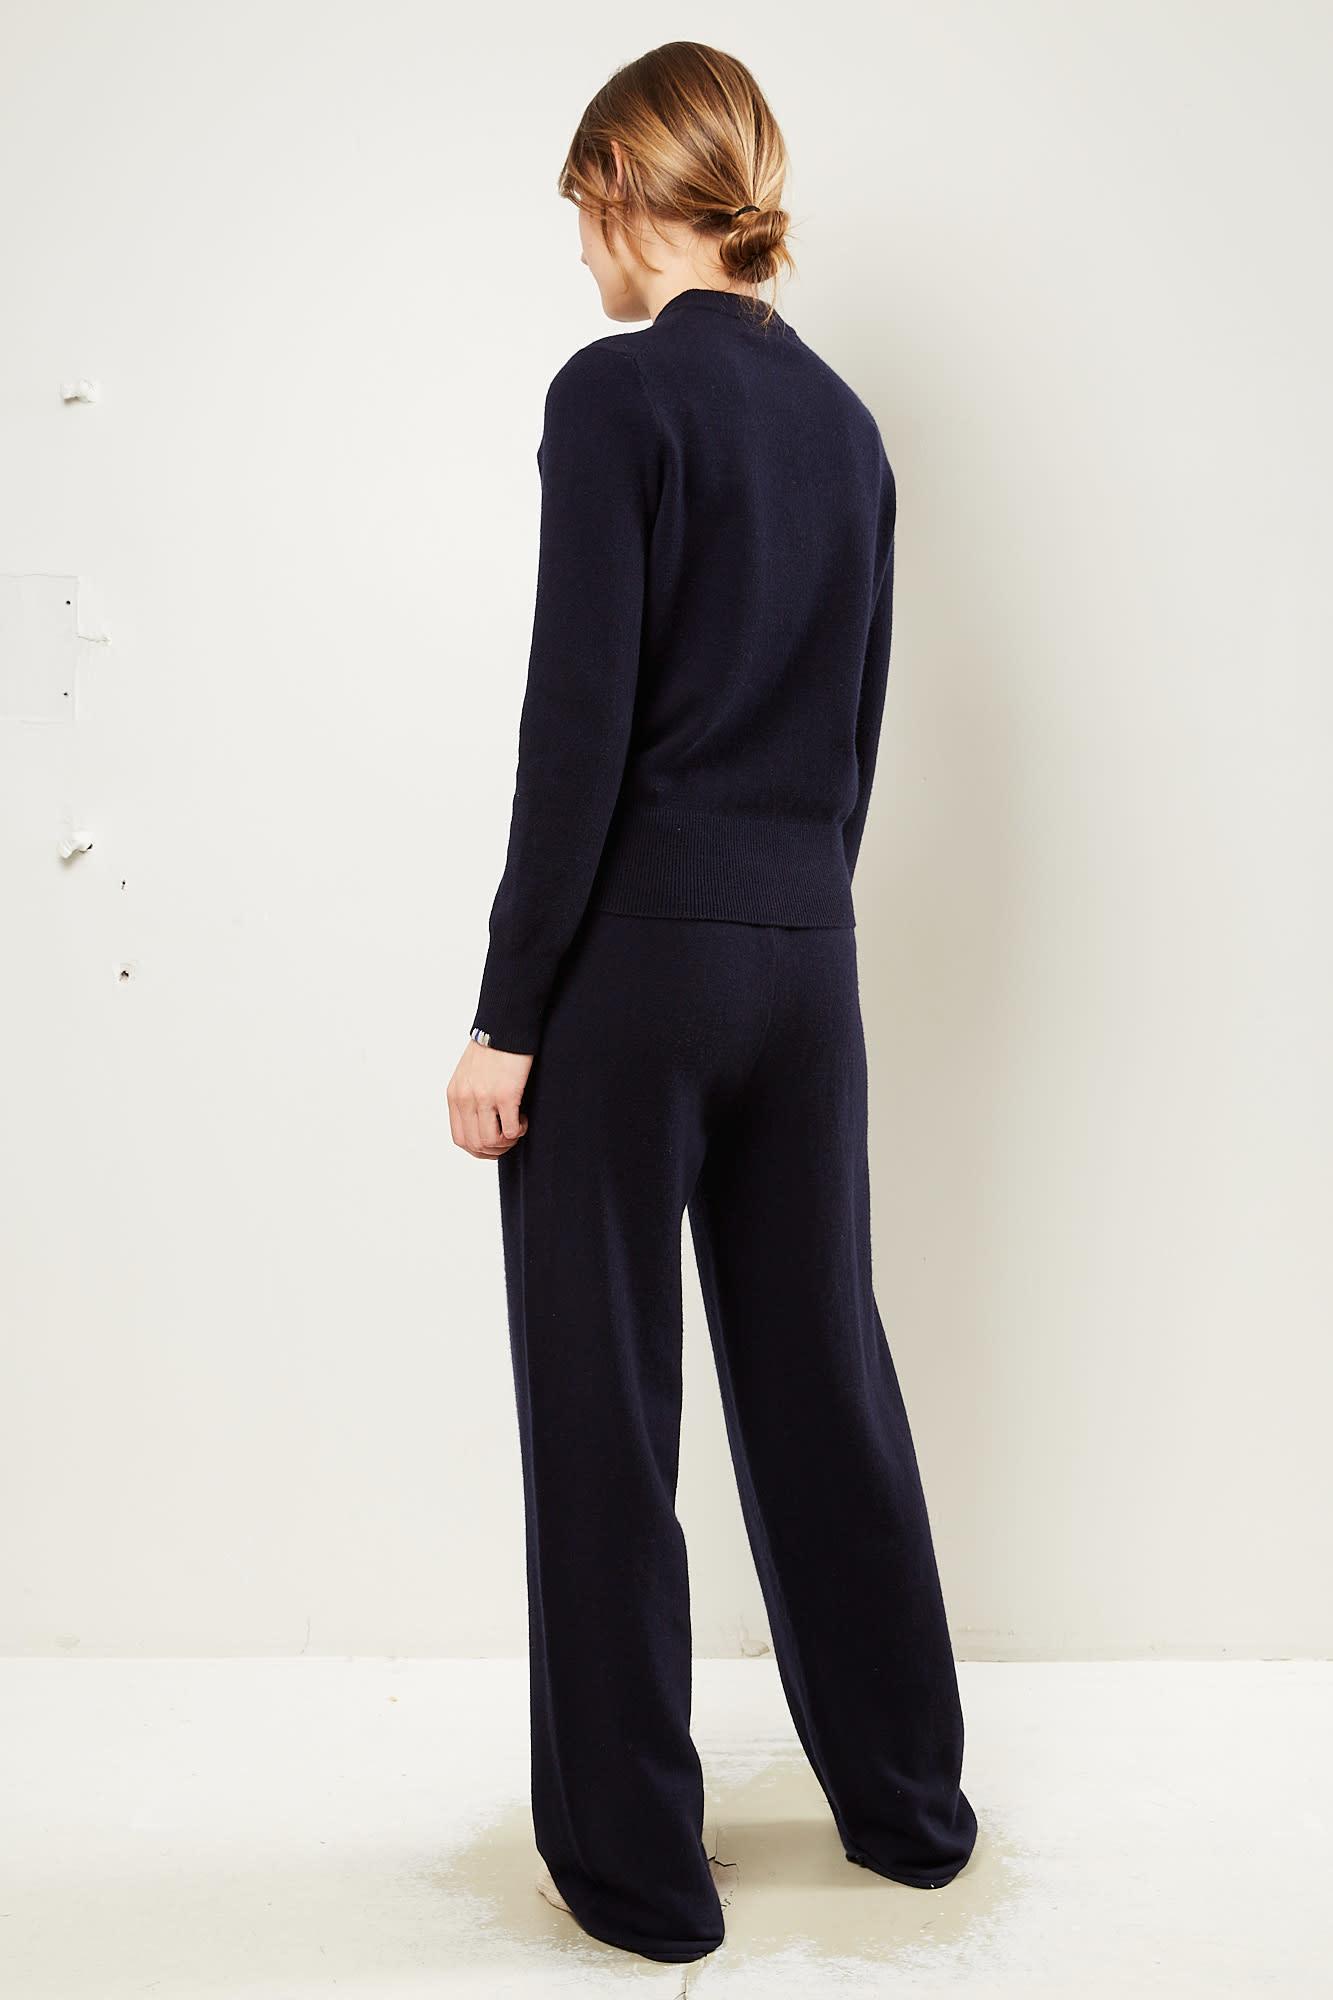 extreme cashmere - No104 Trousers wide leg pants